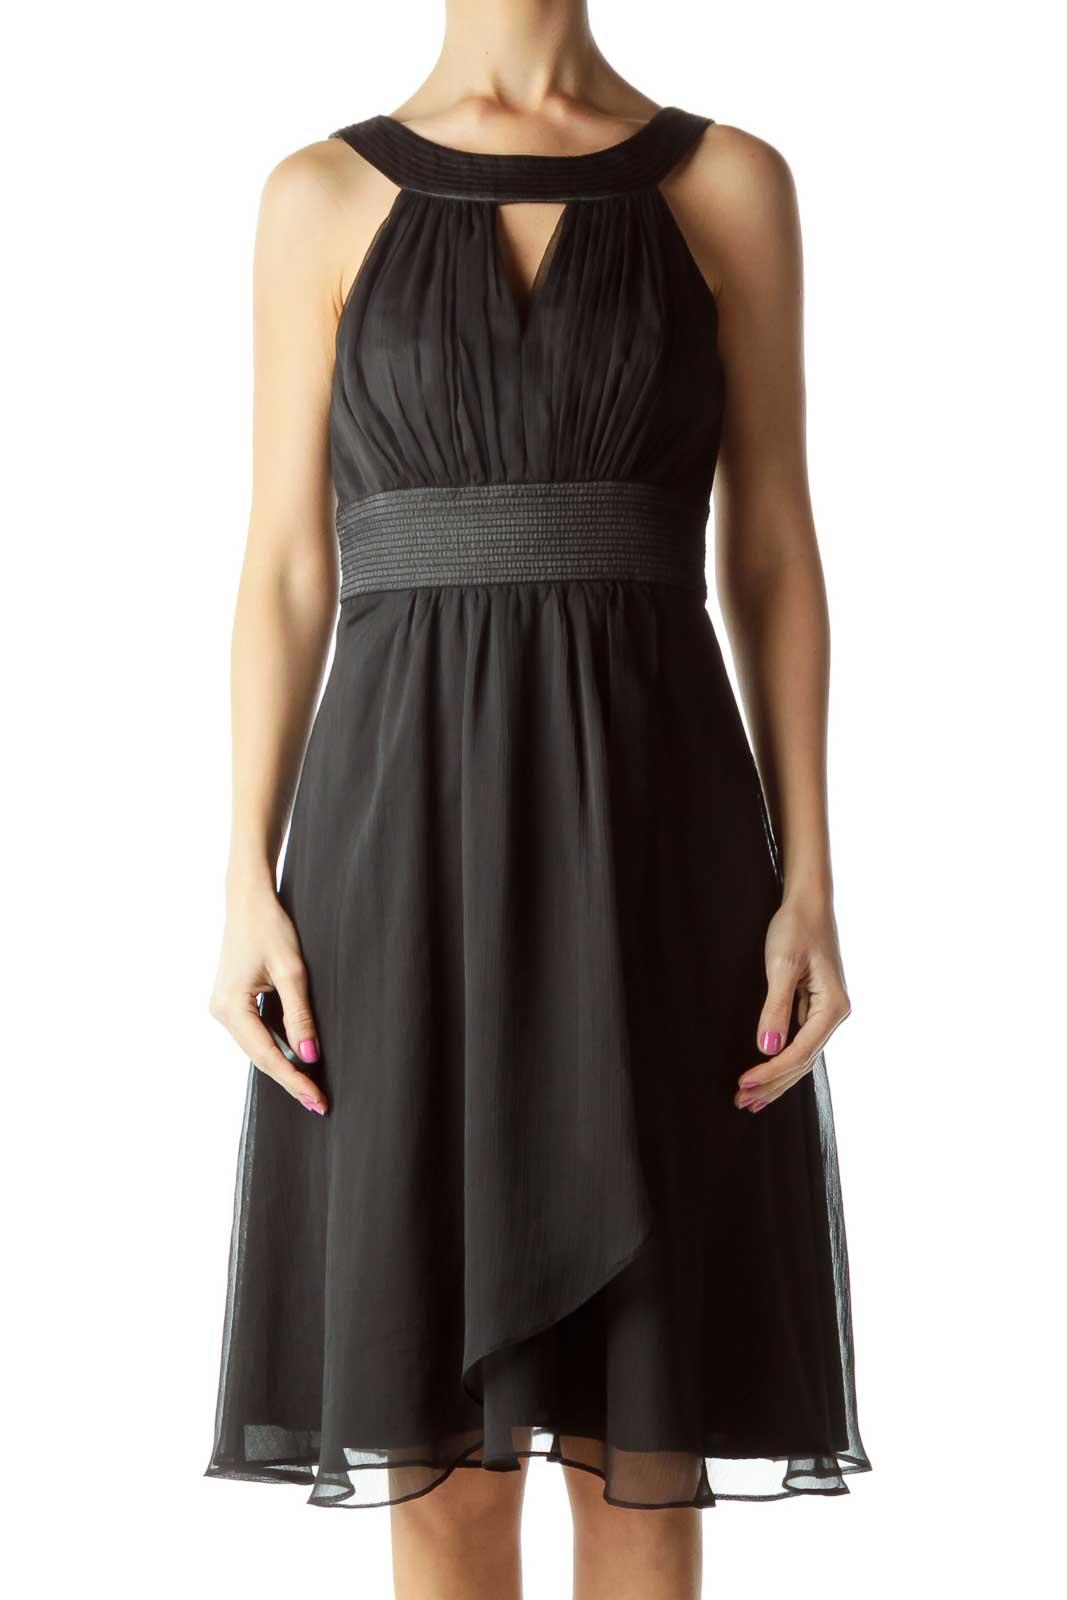 Black A-Line Cocktail Dress Front